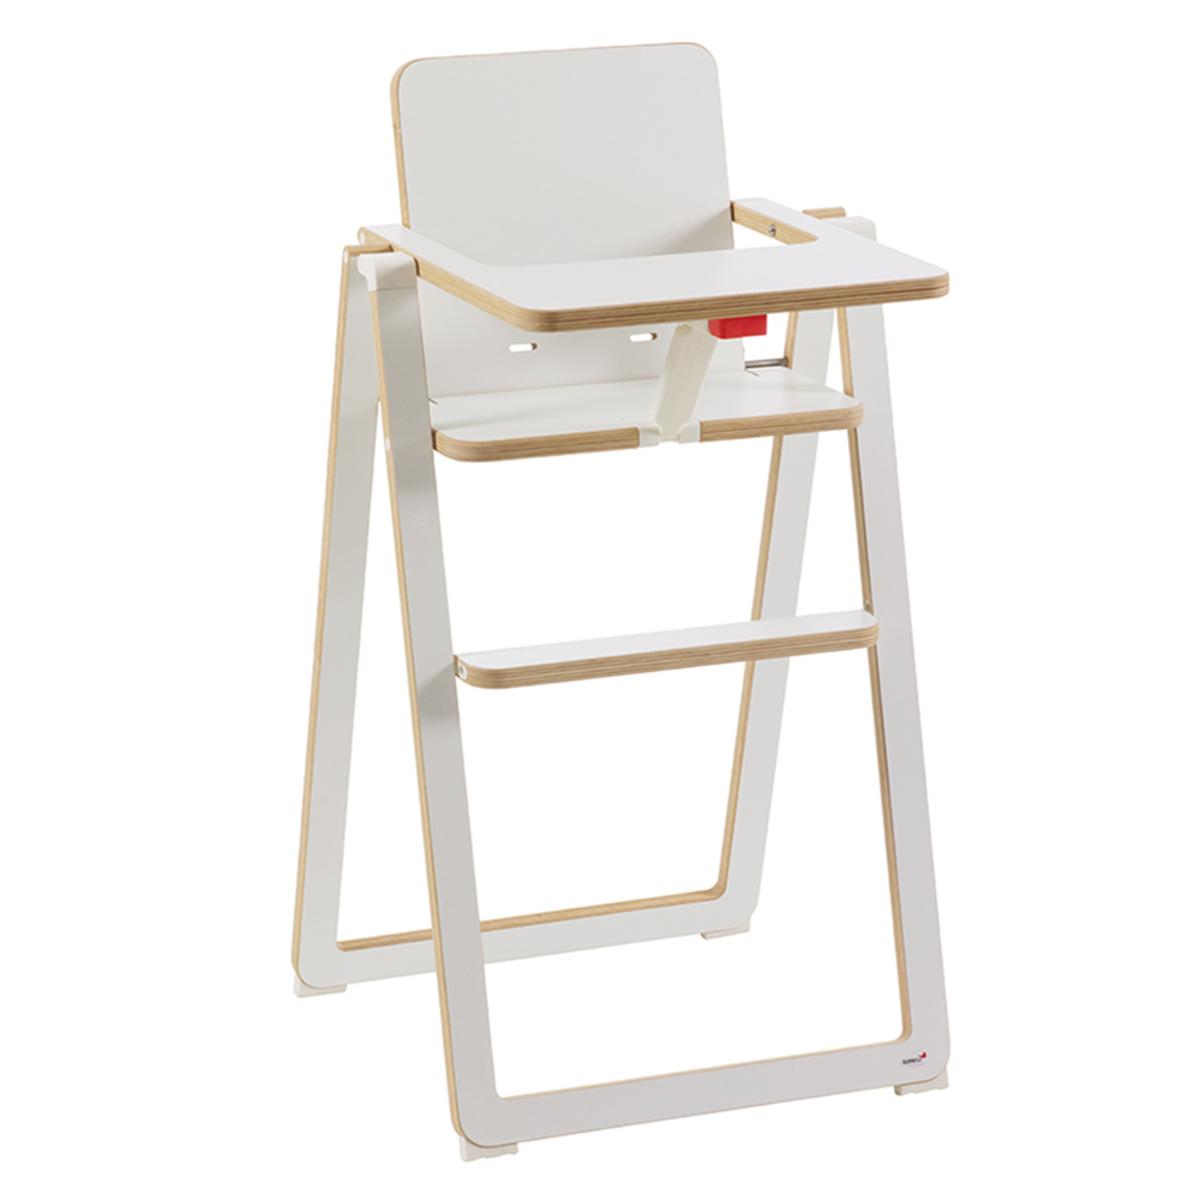 Chaise haute Chaise Haute SUPAflat - Blanc Chaise Haute SUPAflat - Blanc